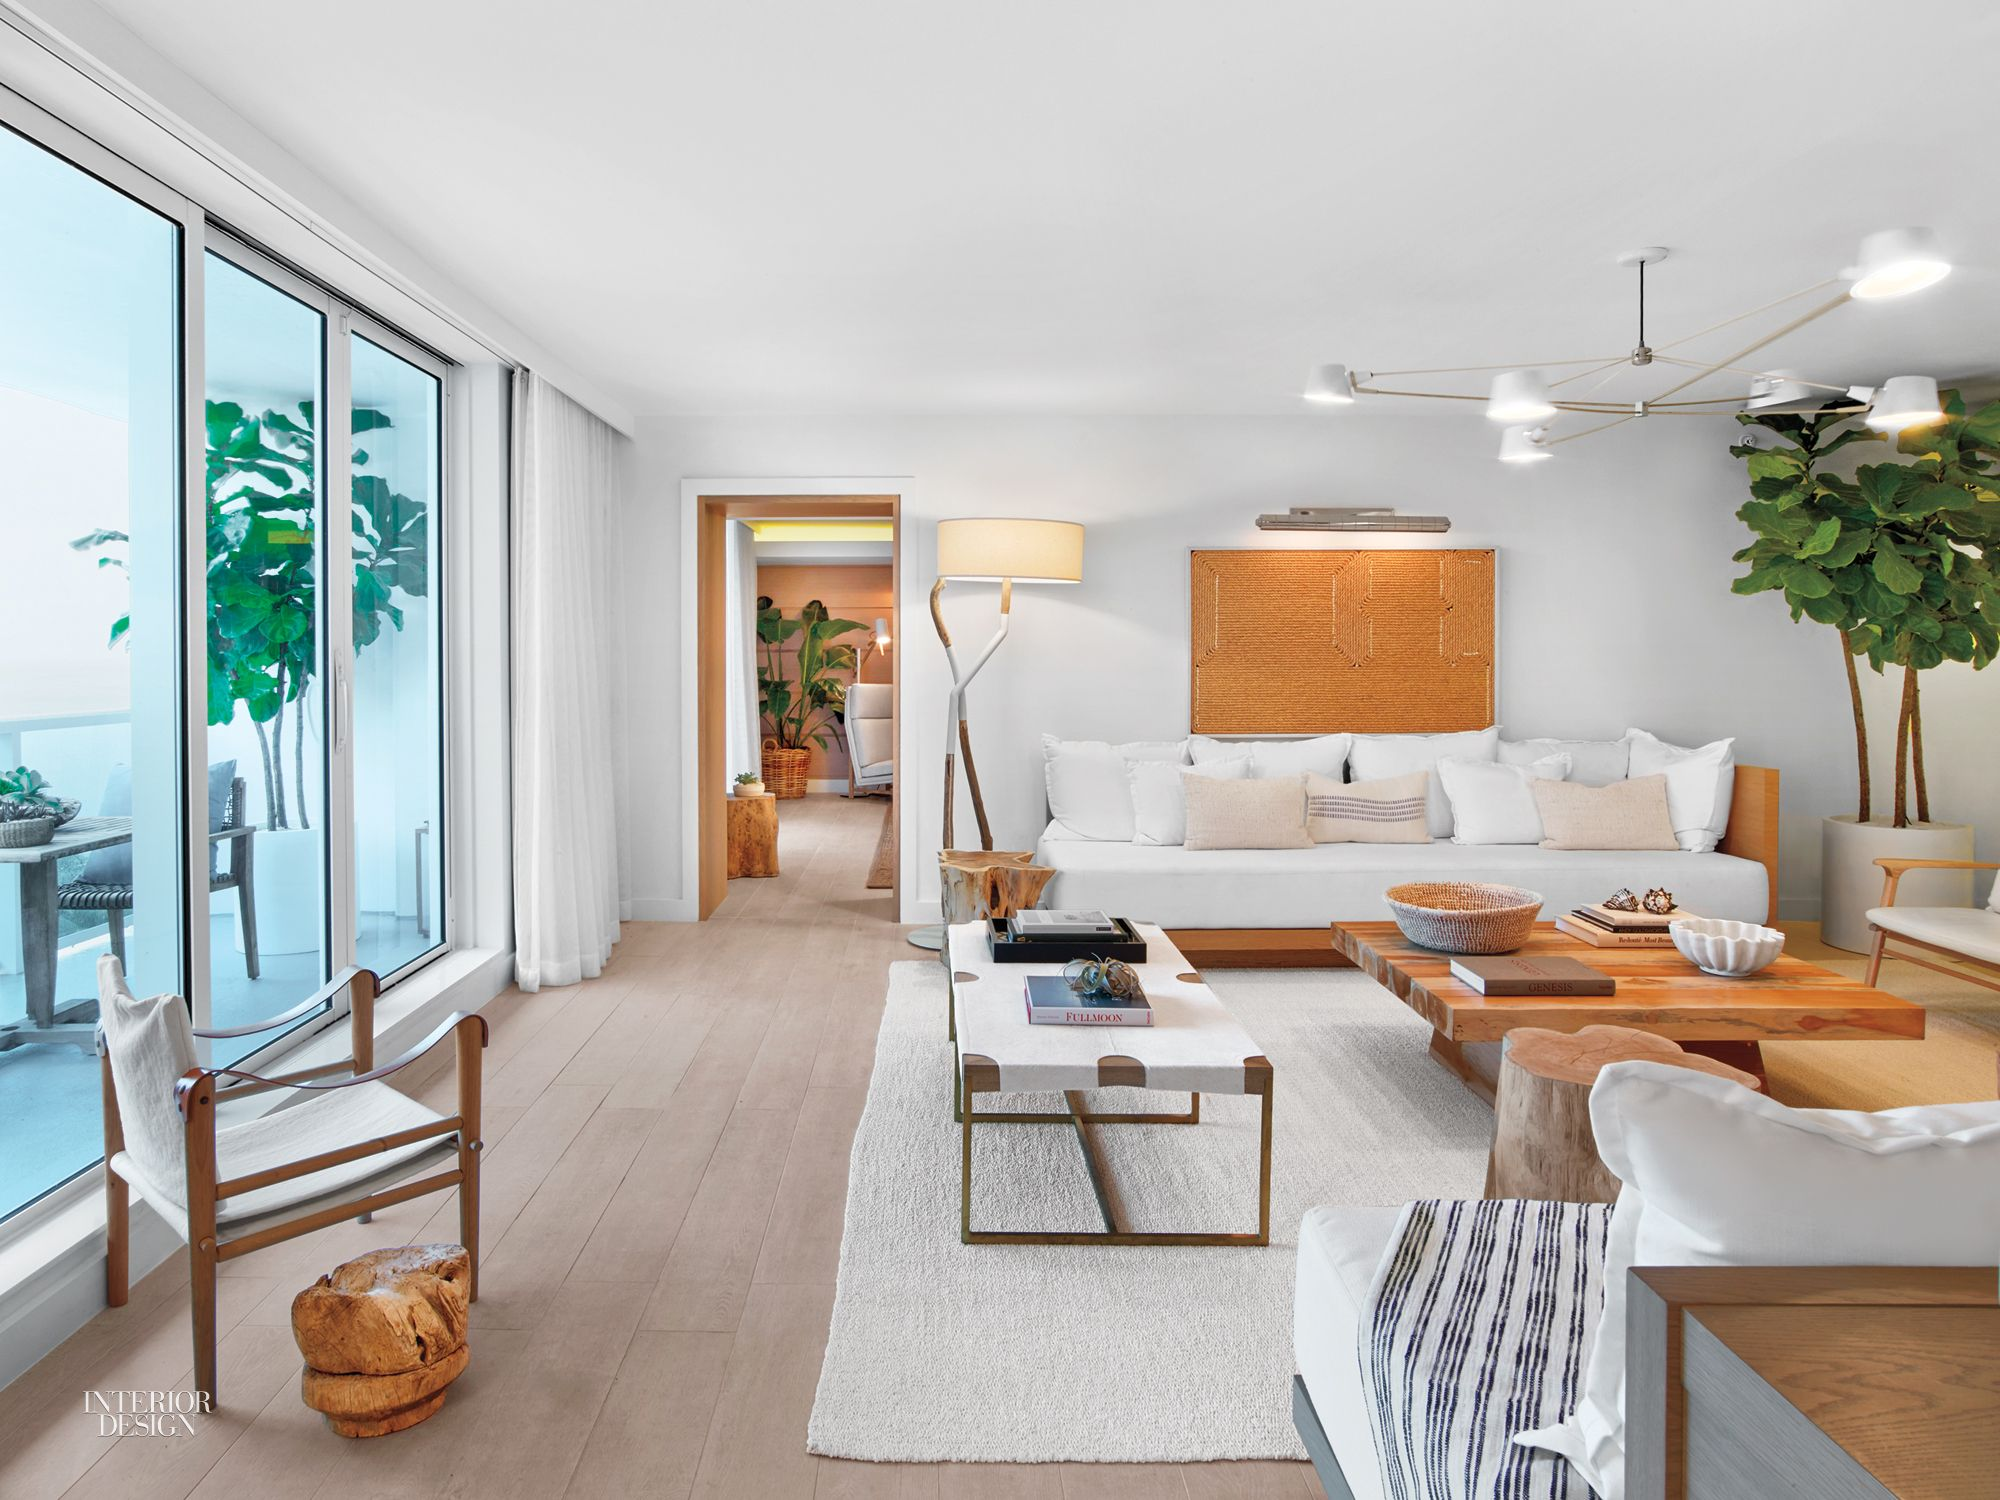 Meyer davis craft serene presidential suite for 1 hotel south beach hotel suites hotel interiors